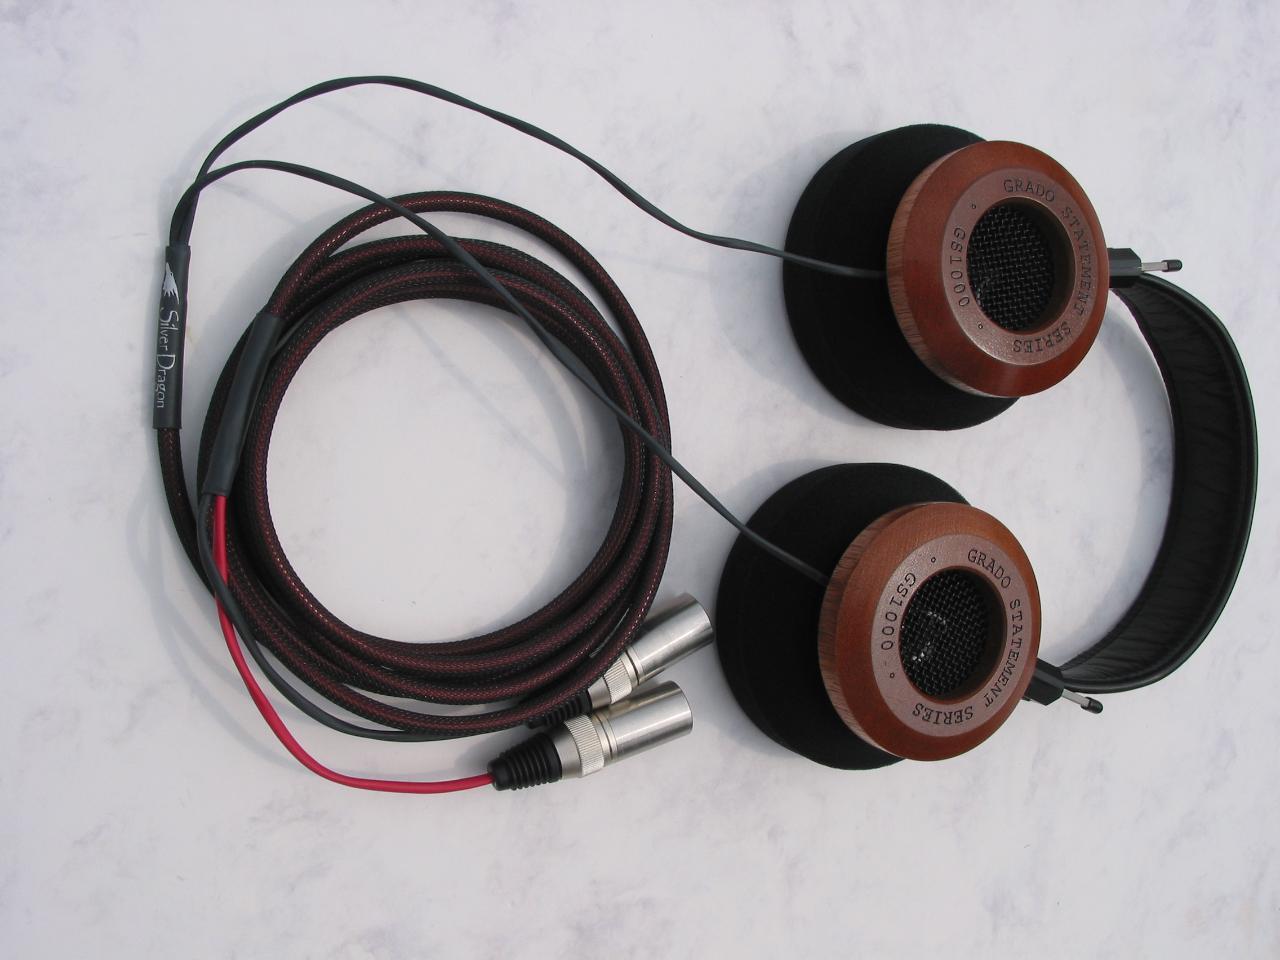 Grado GS1000 Silver Dragon V2 Headphone Cable